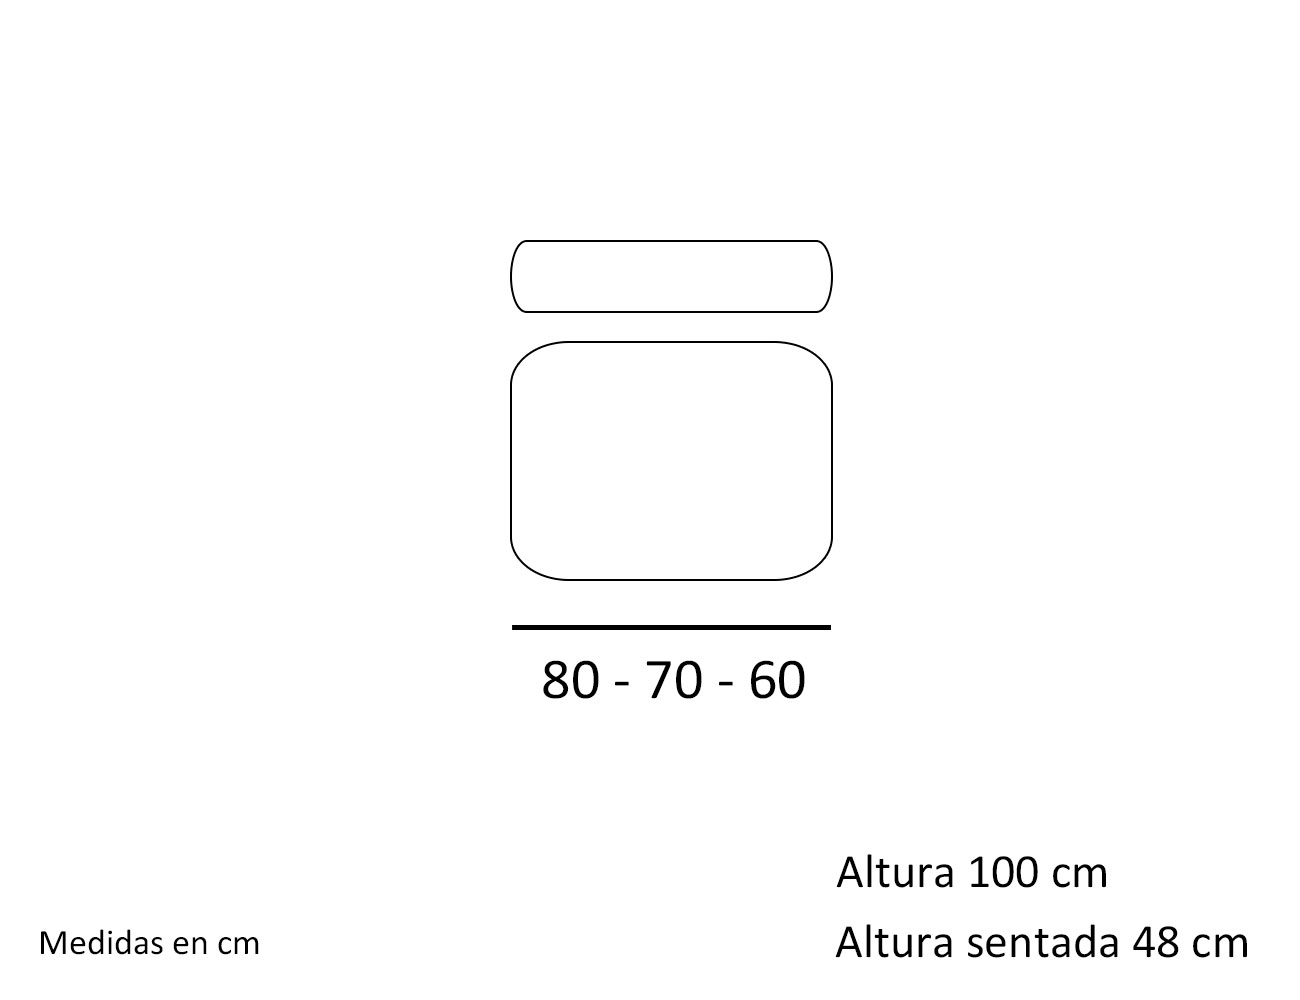 Croquis modulo 1 plaza sin brazo 60 70 802